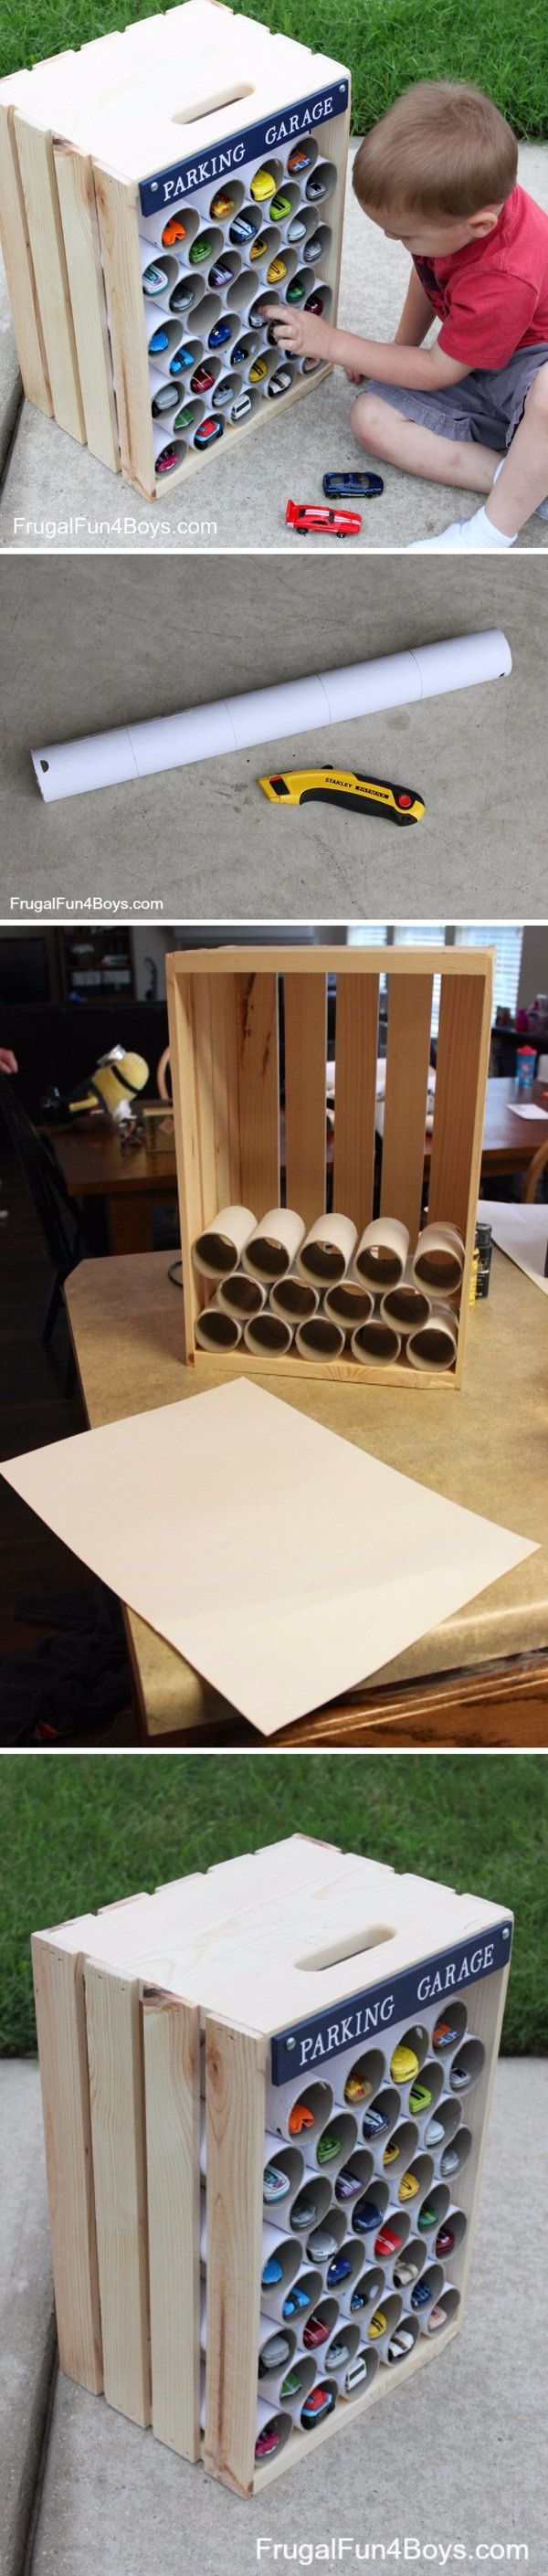 DIY Crate Hot Wheels Storage for Kids.